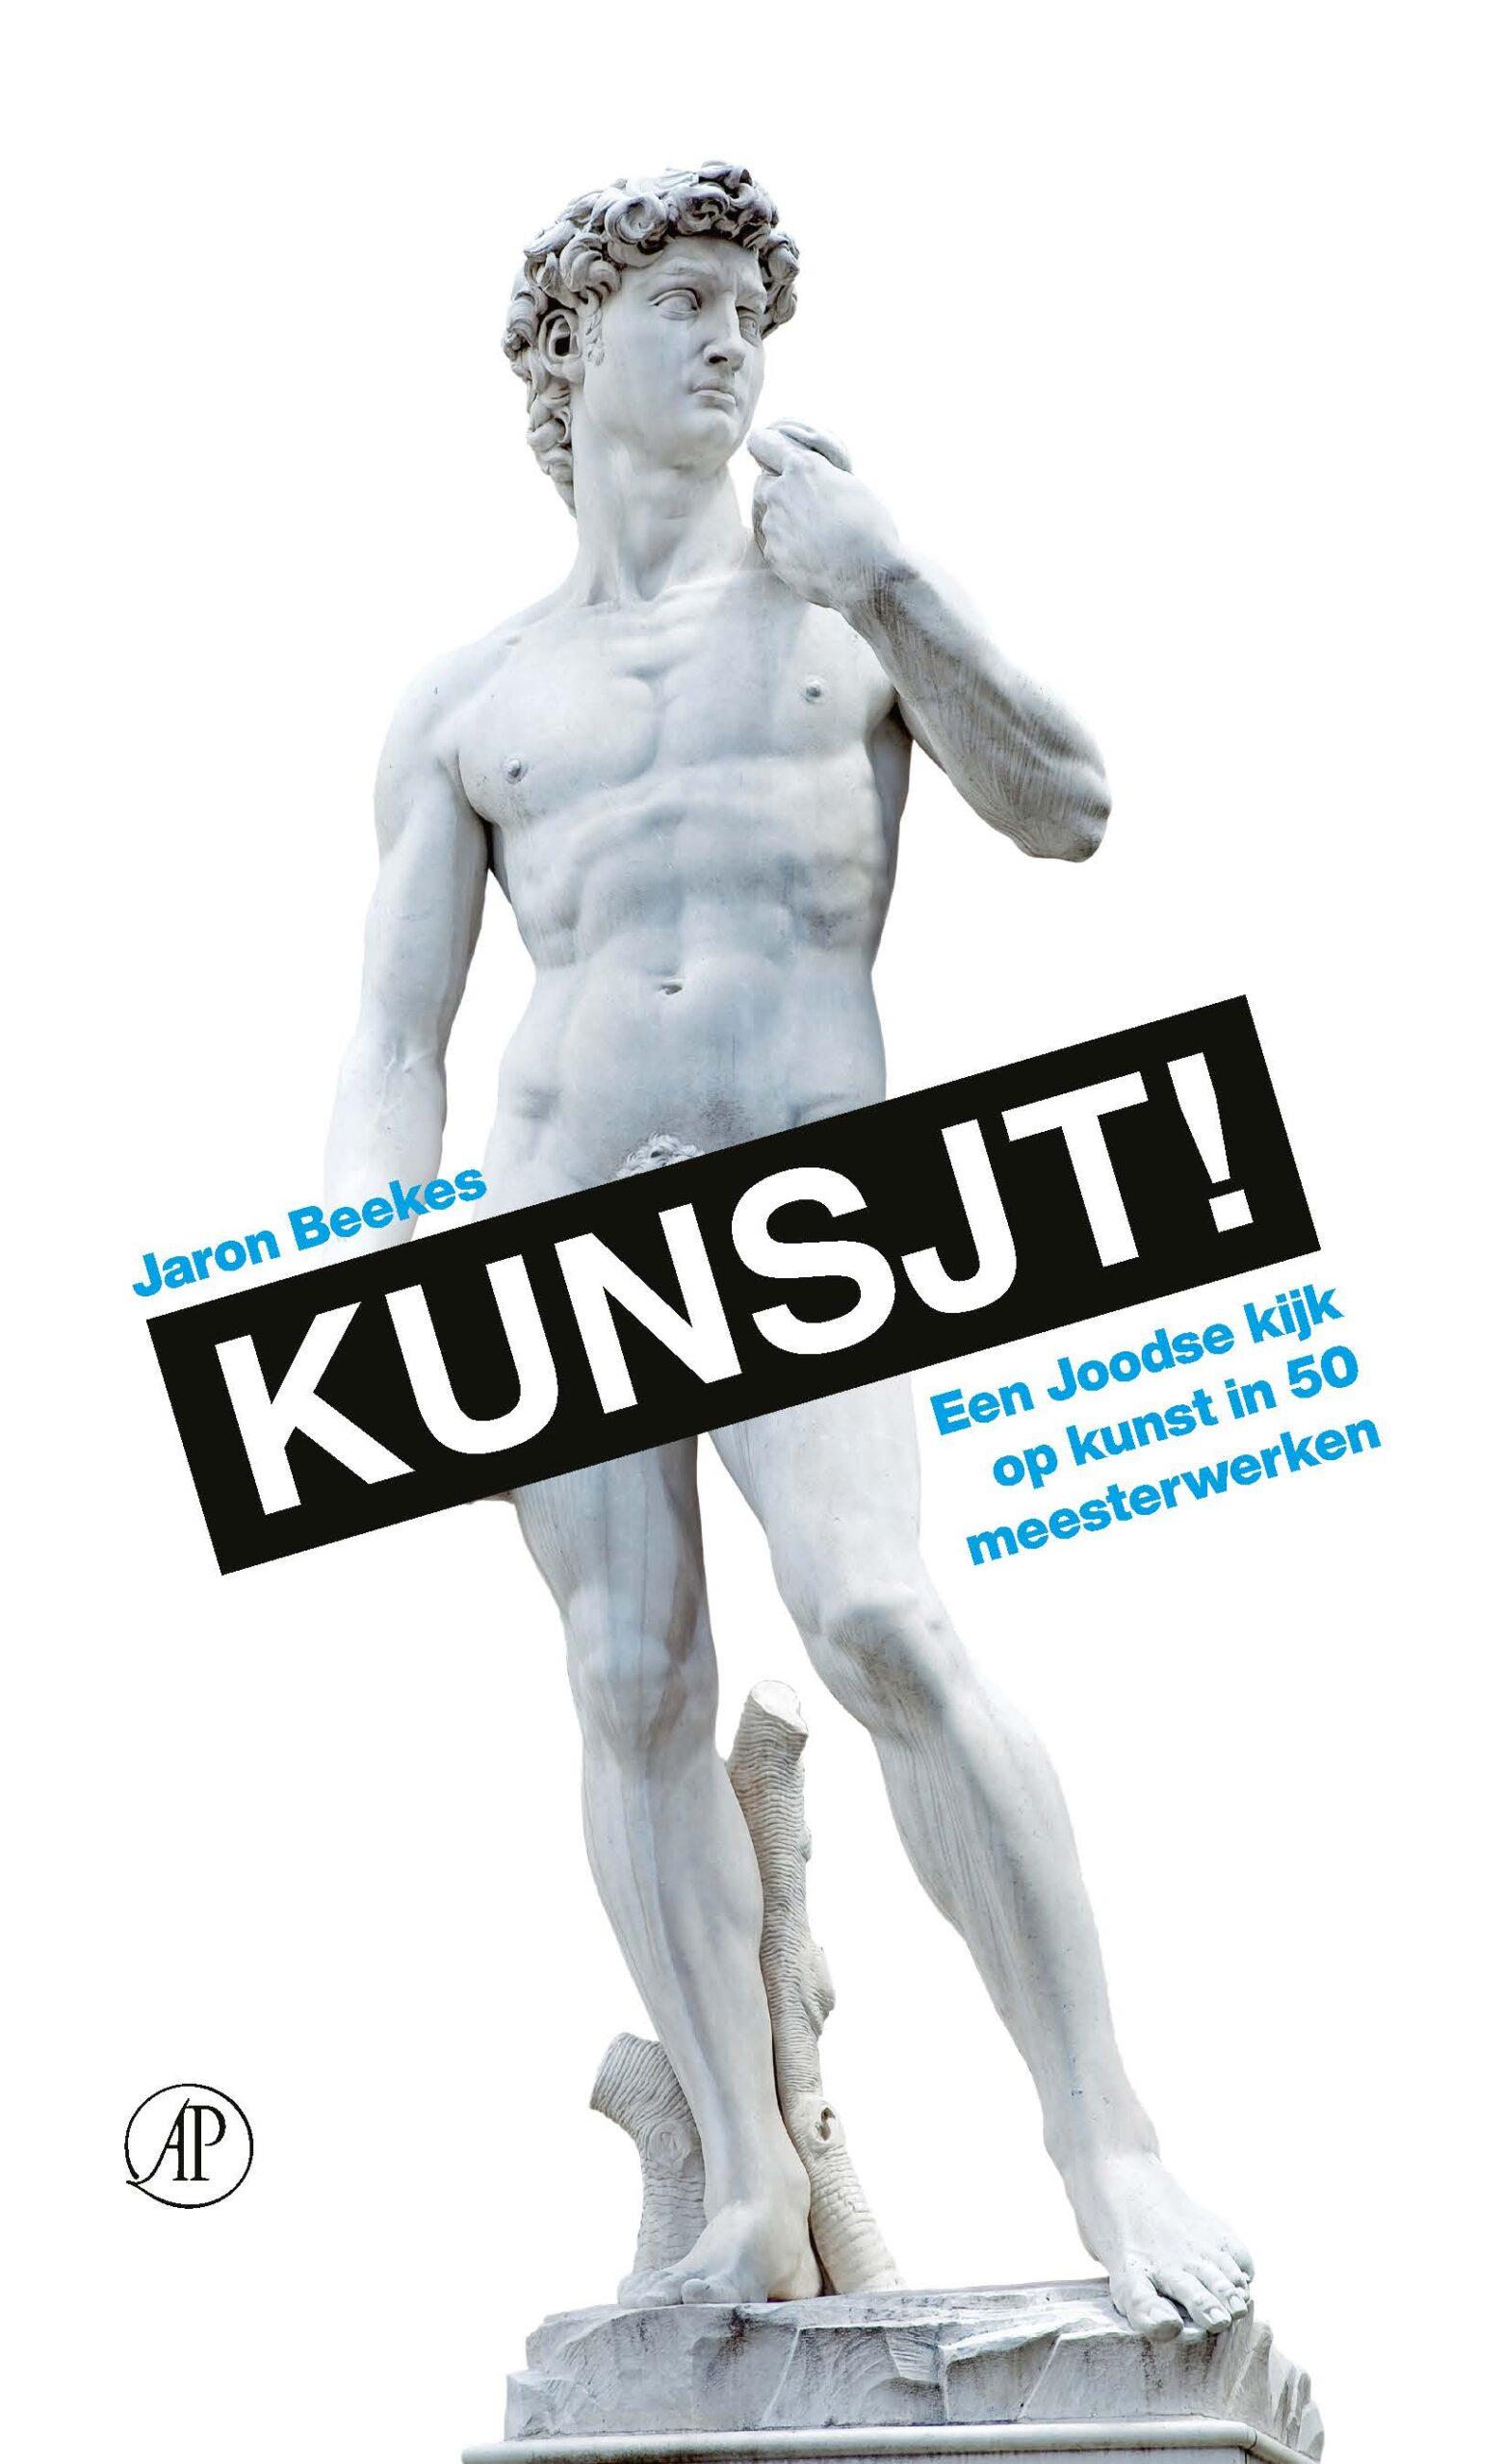 Kunsjt - boekenflits.nl